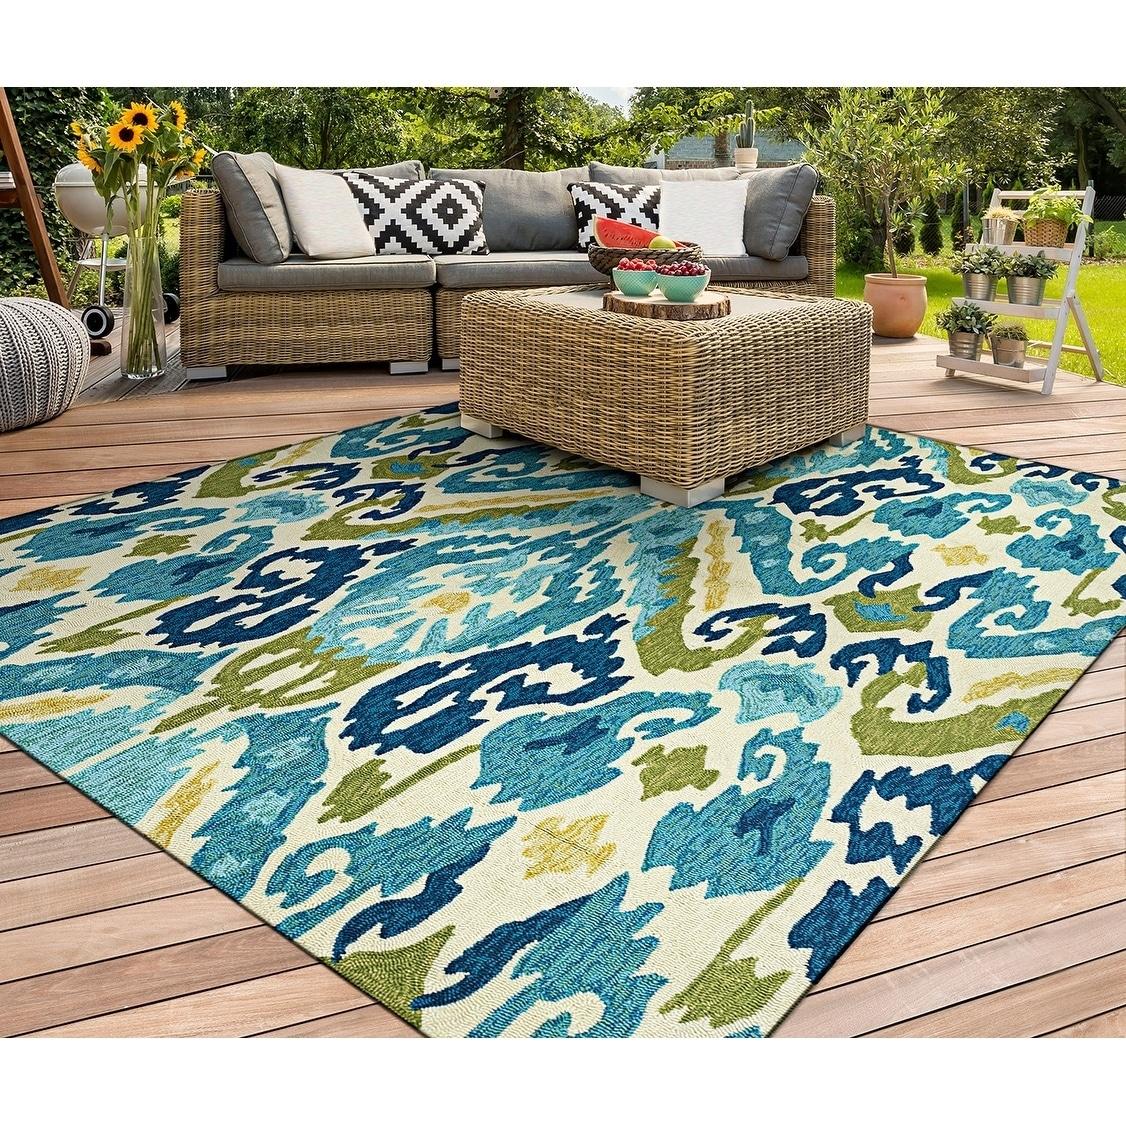 Miami London Blue-Lemon Indoor/Outdoor Area Rug - 36 x 56 (36 x 56 - blue/lemon)